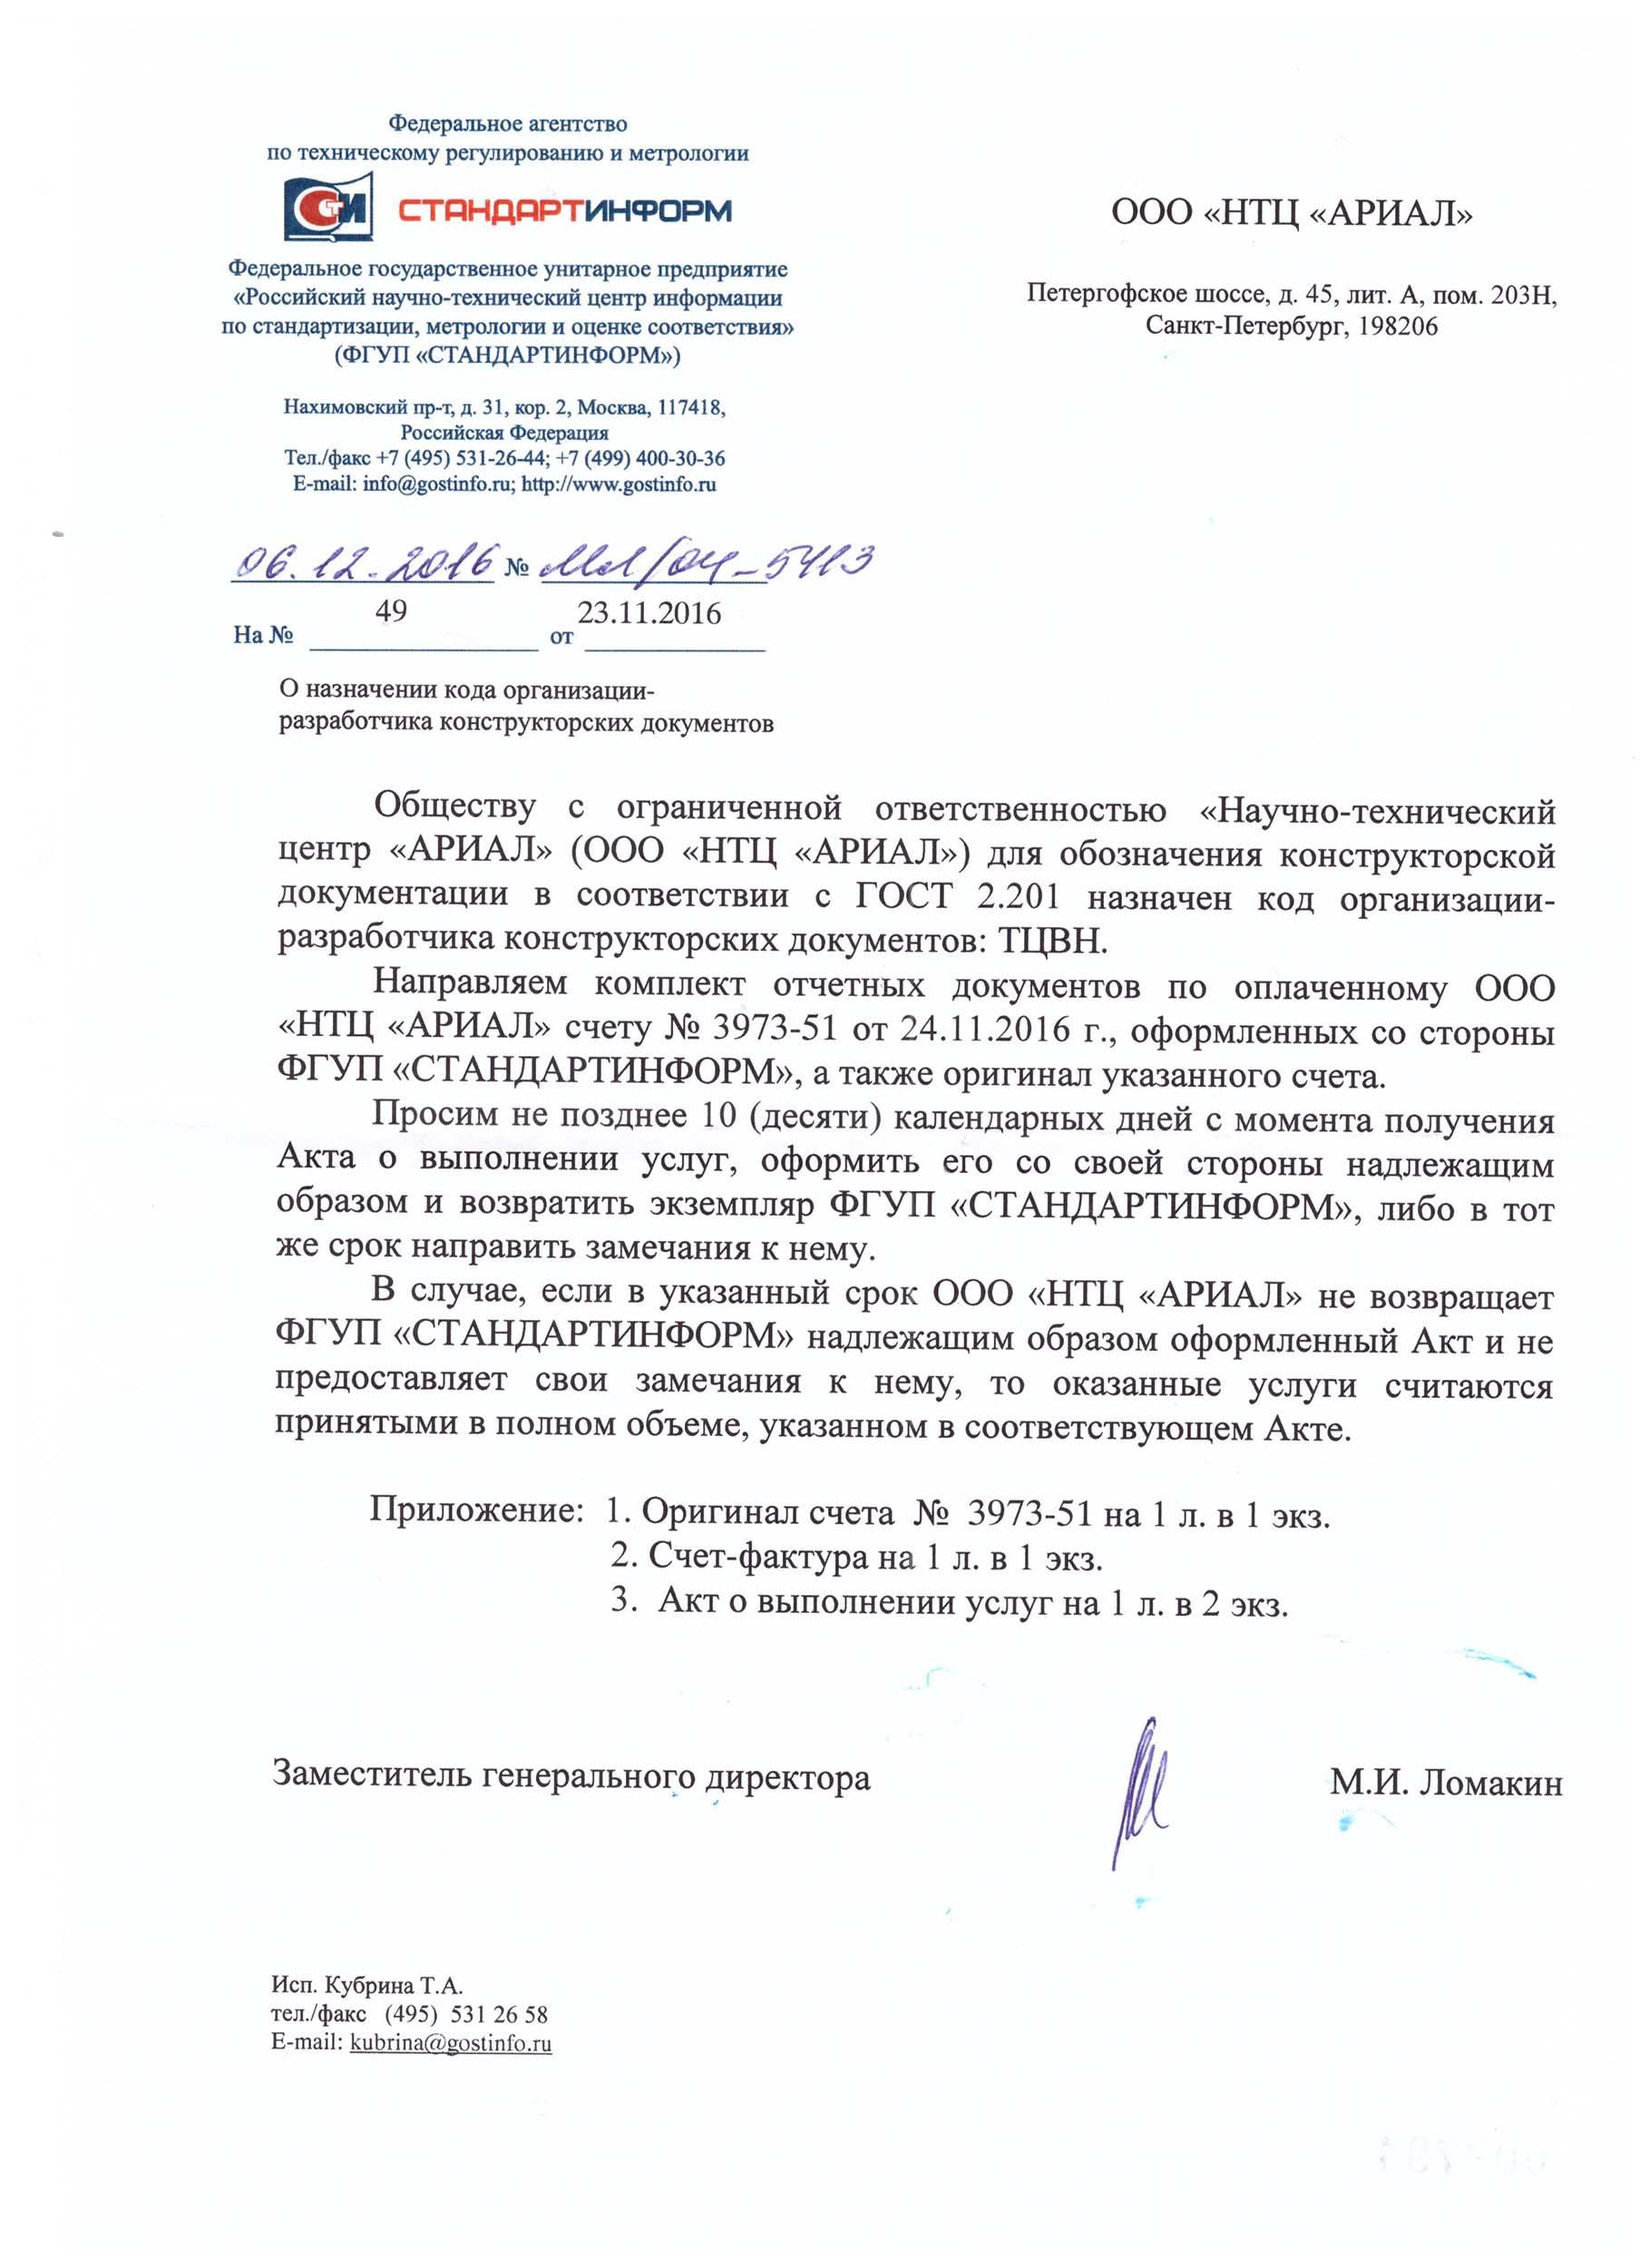 ФГУП Стандартинформ1